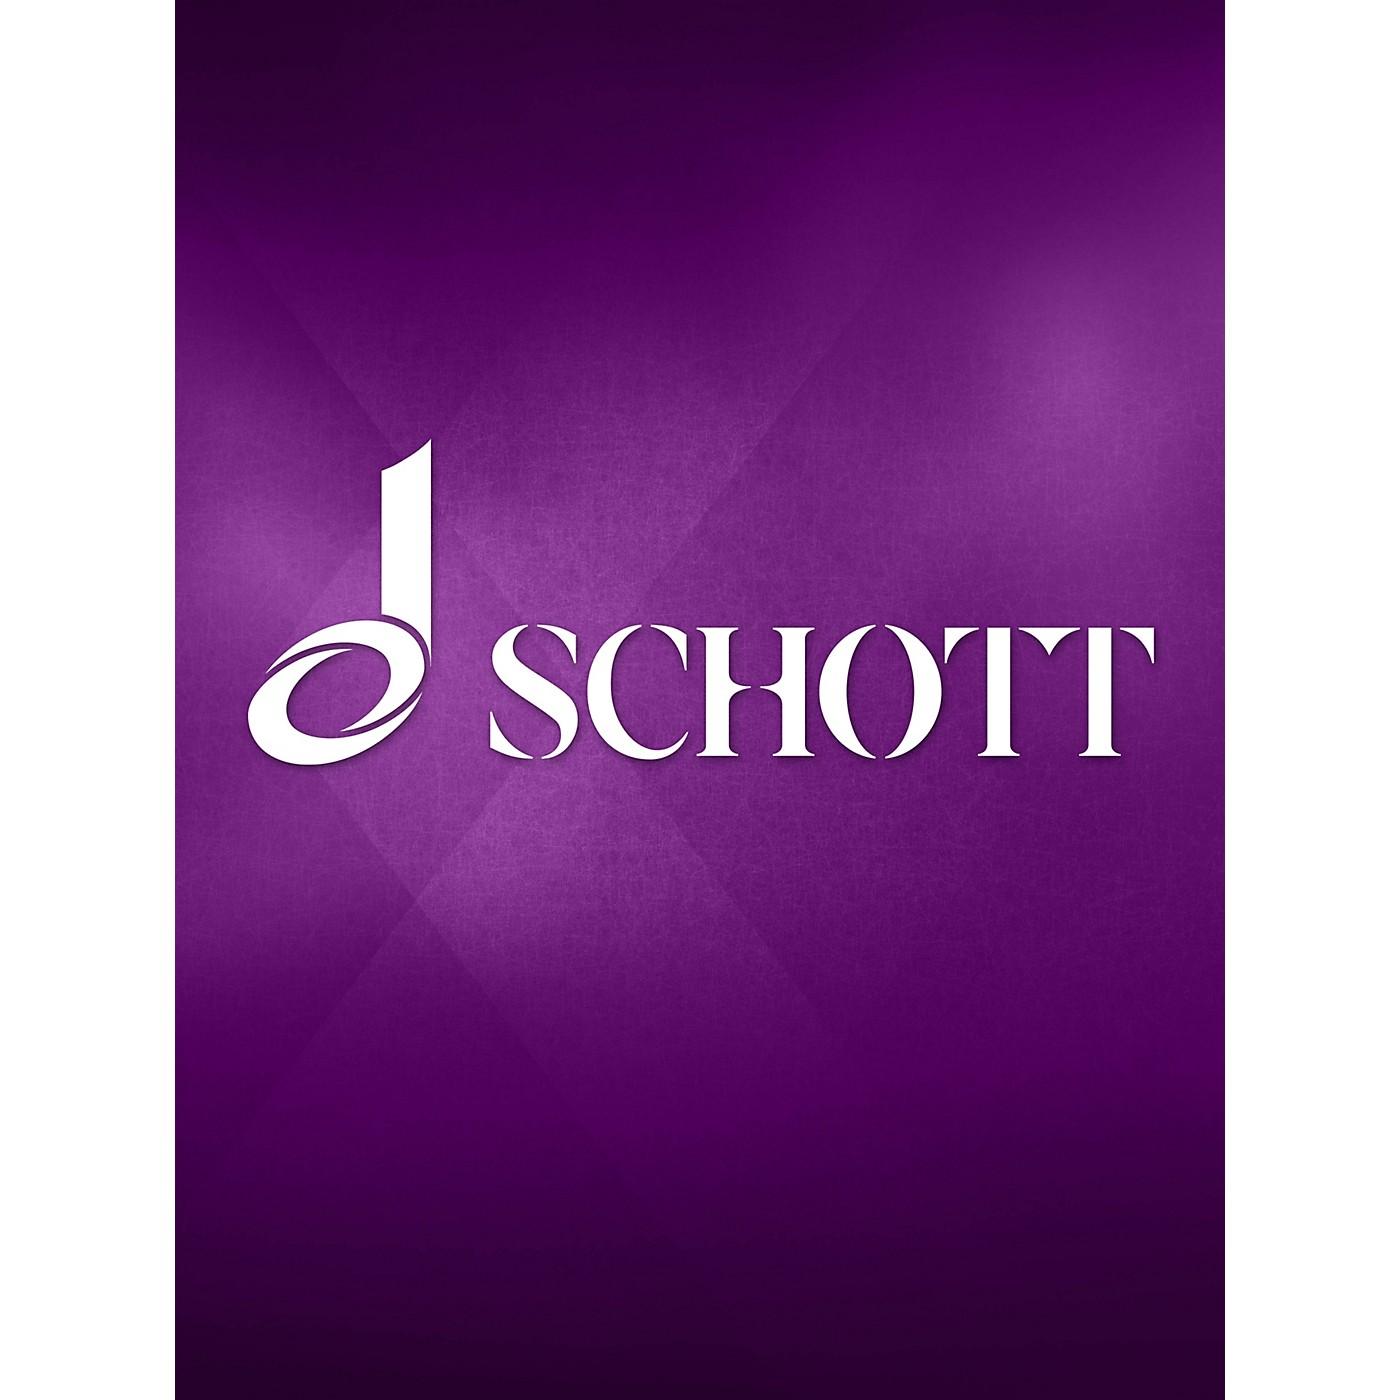 Schott Japan Orion (for Violoncello and Piano - Performance Score) Schott Series thumbnail